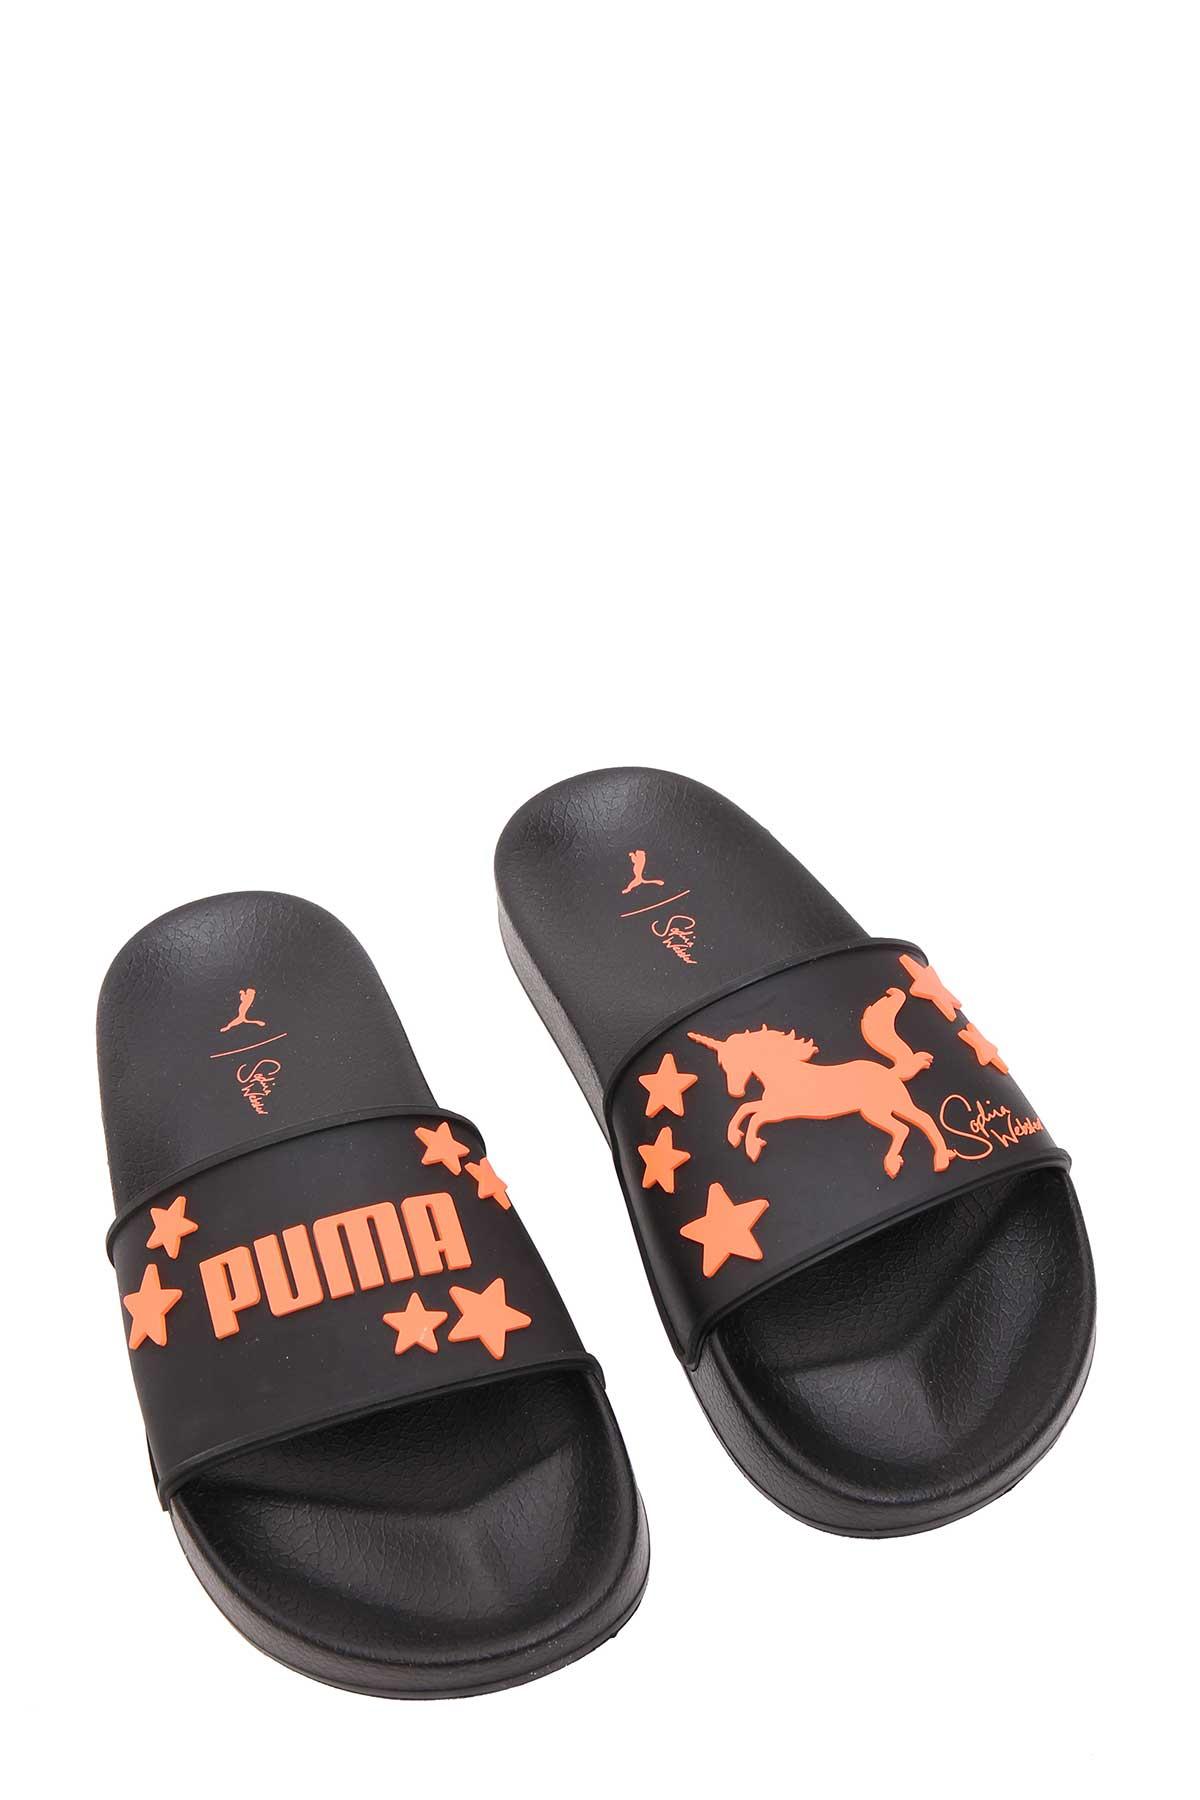 PUMA Leadcat Sophia Webster Rubber Slide B5rAGwee7e